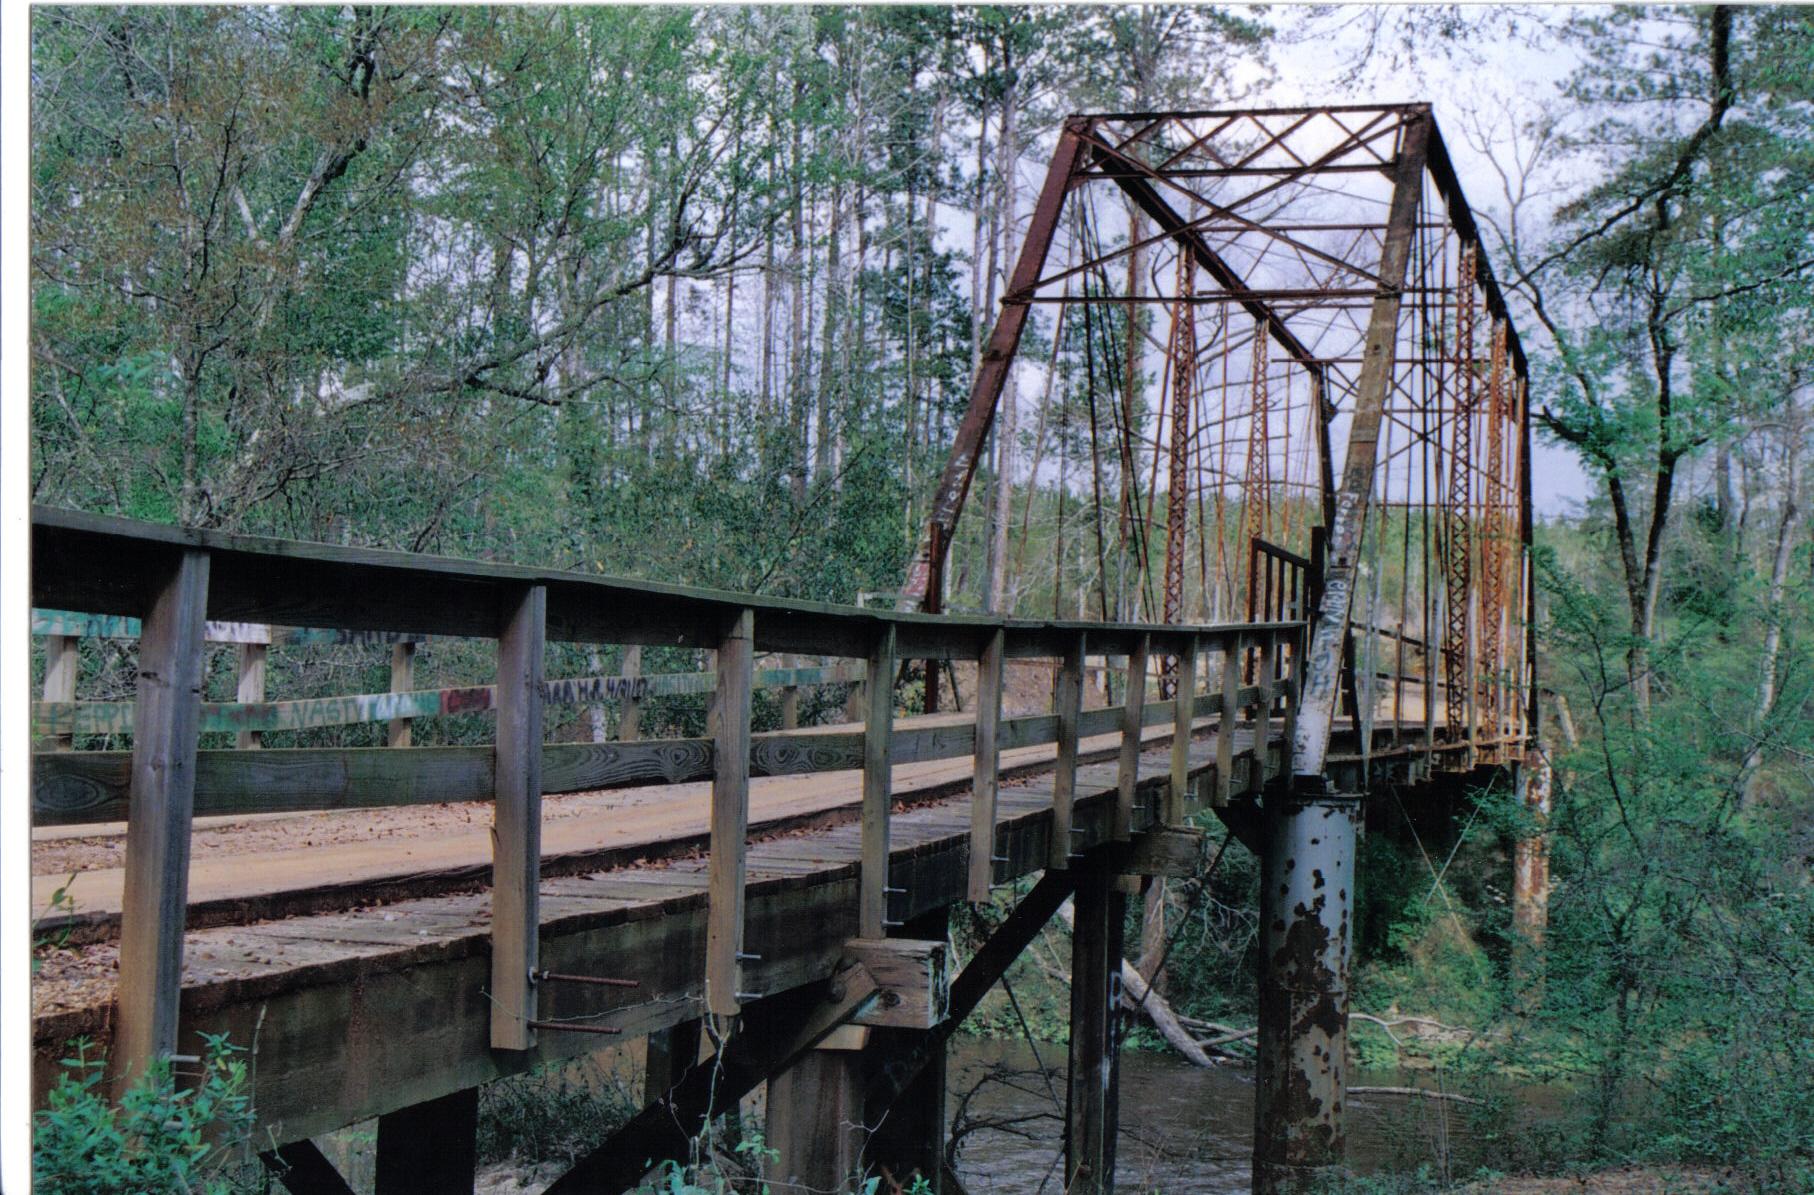 Stuckey's Bridge